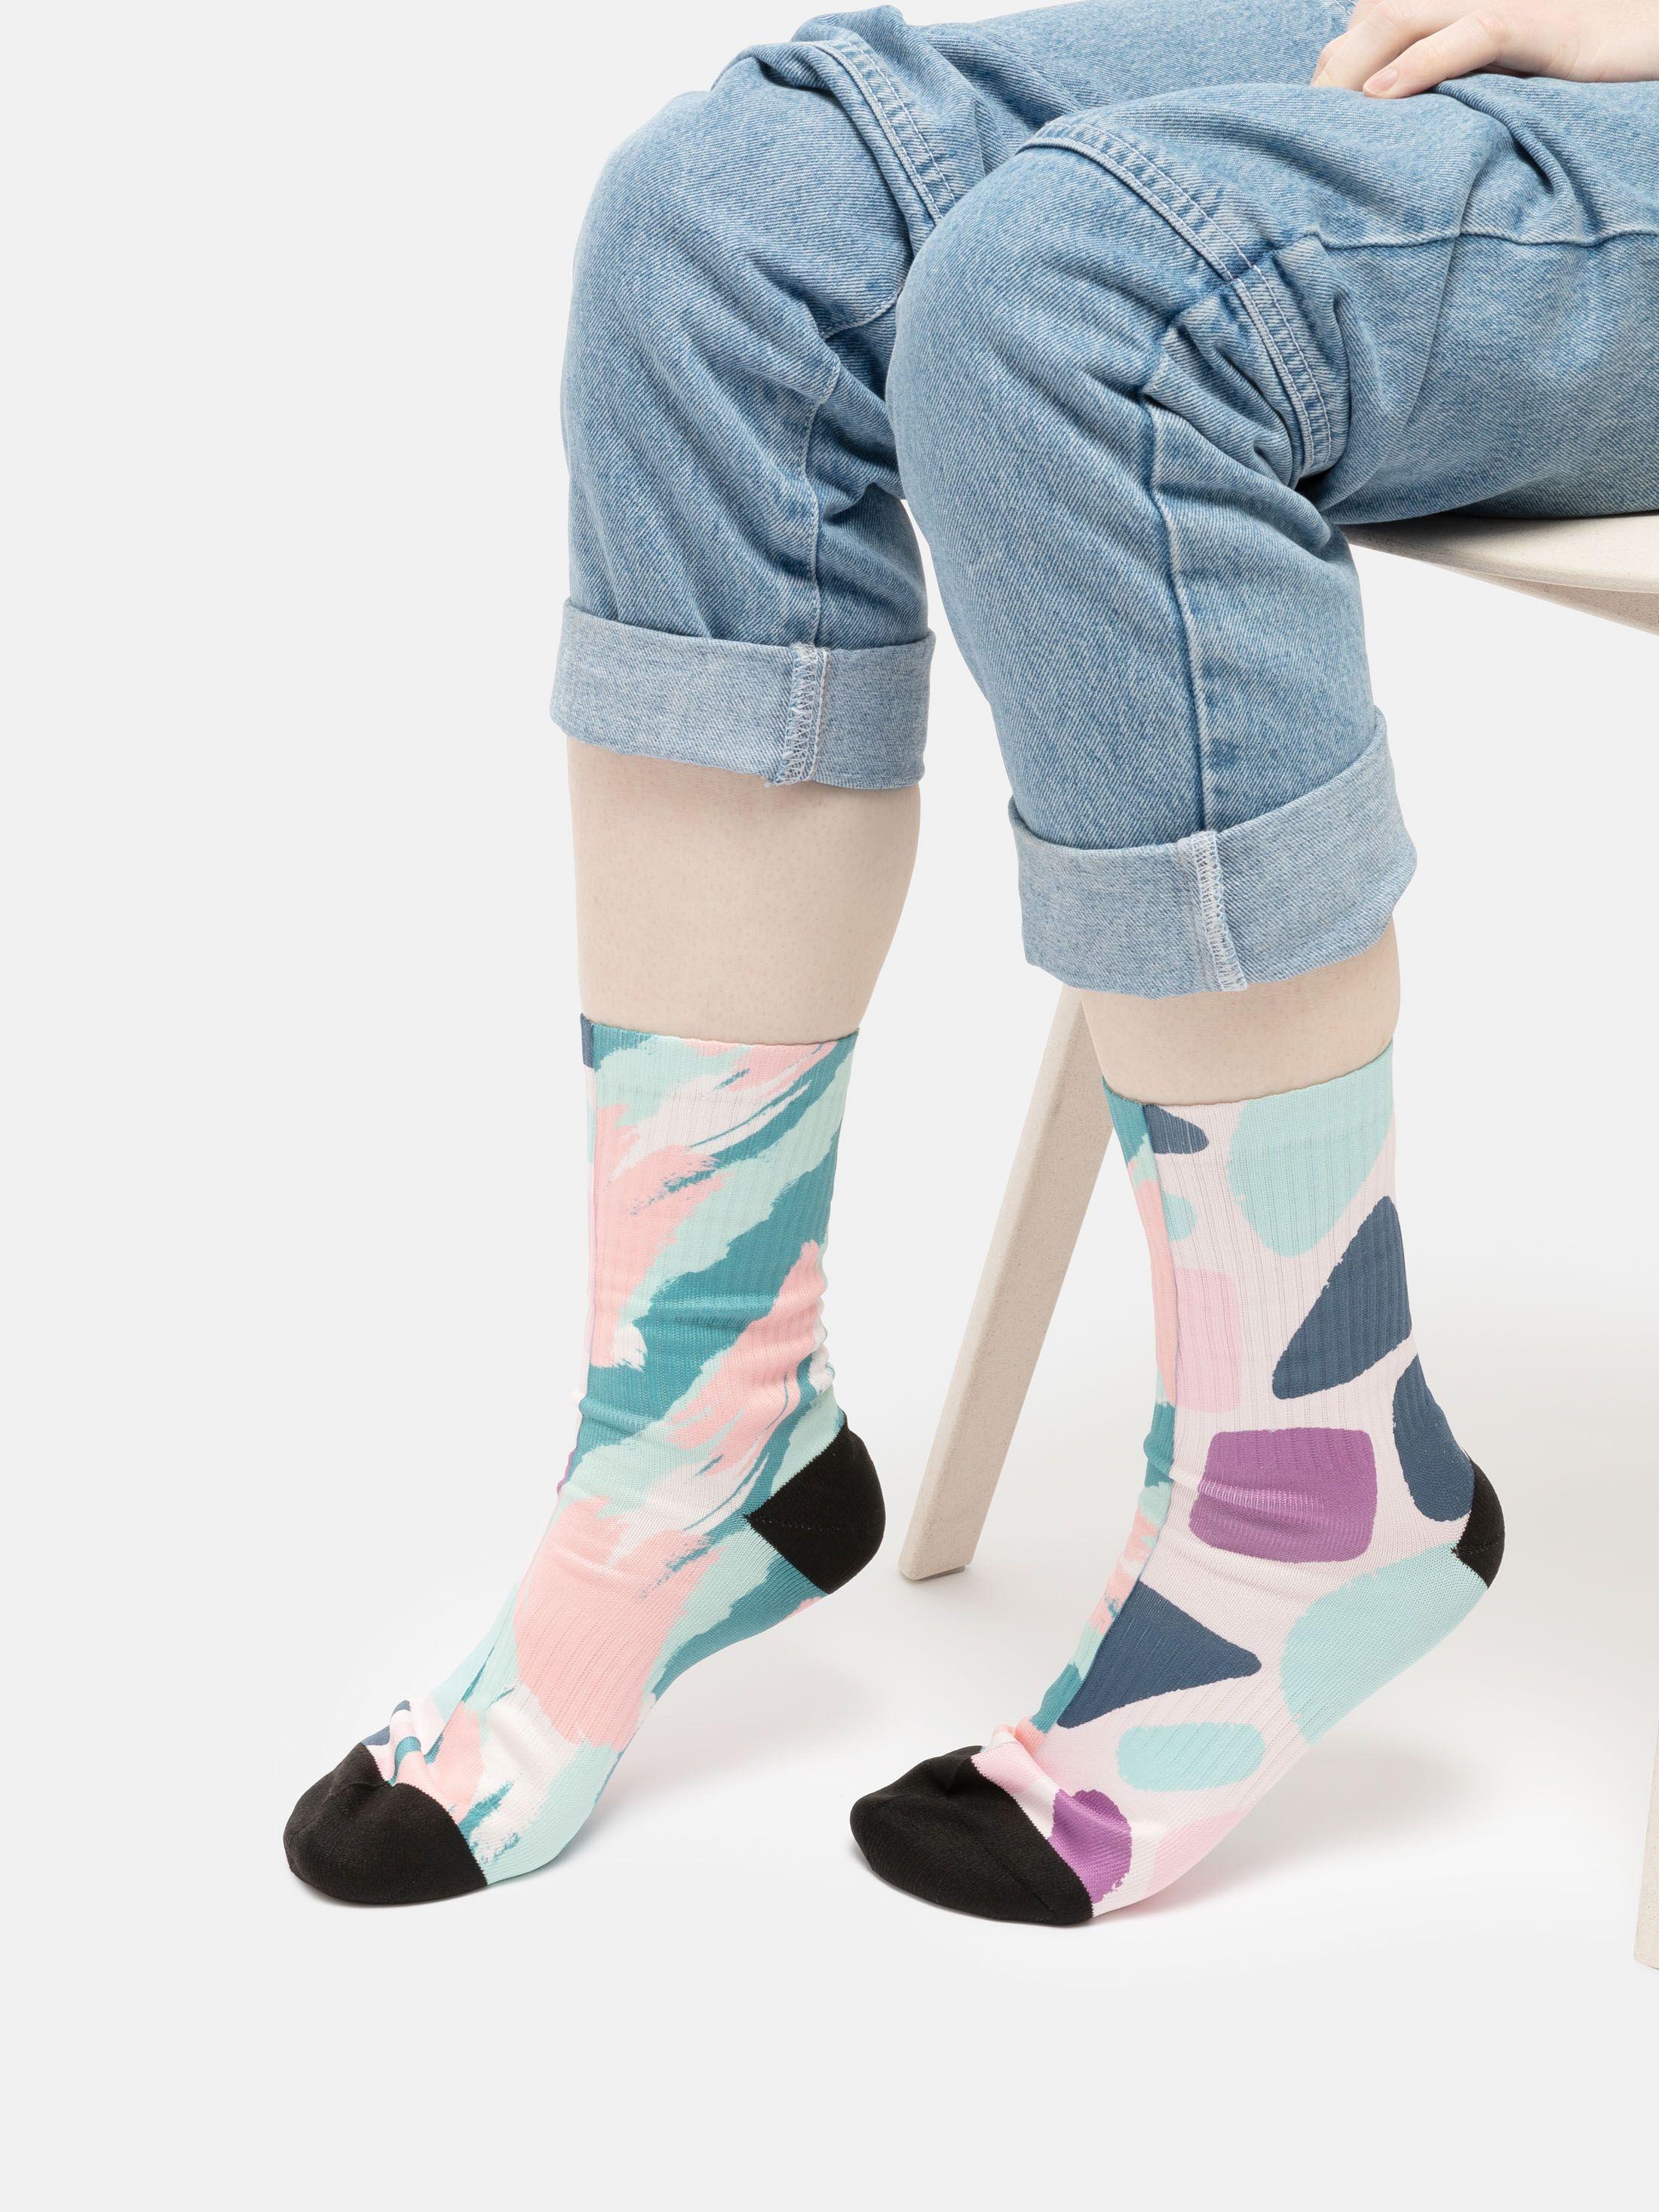 custom socks with logos